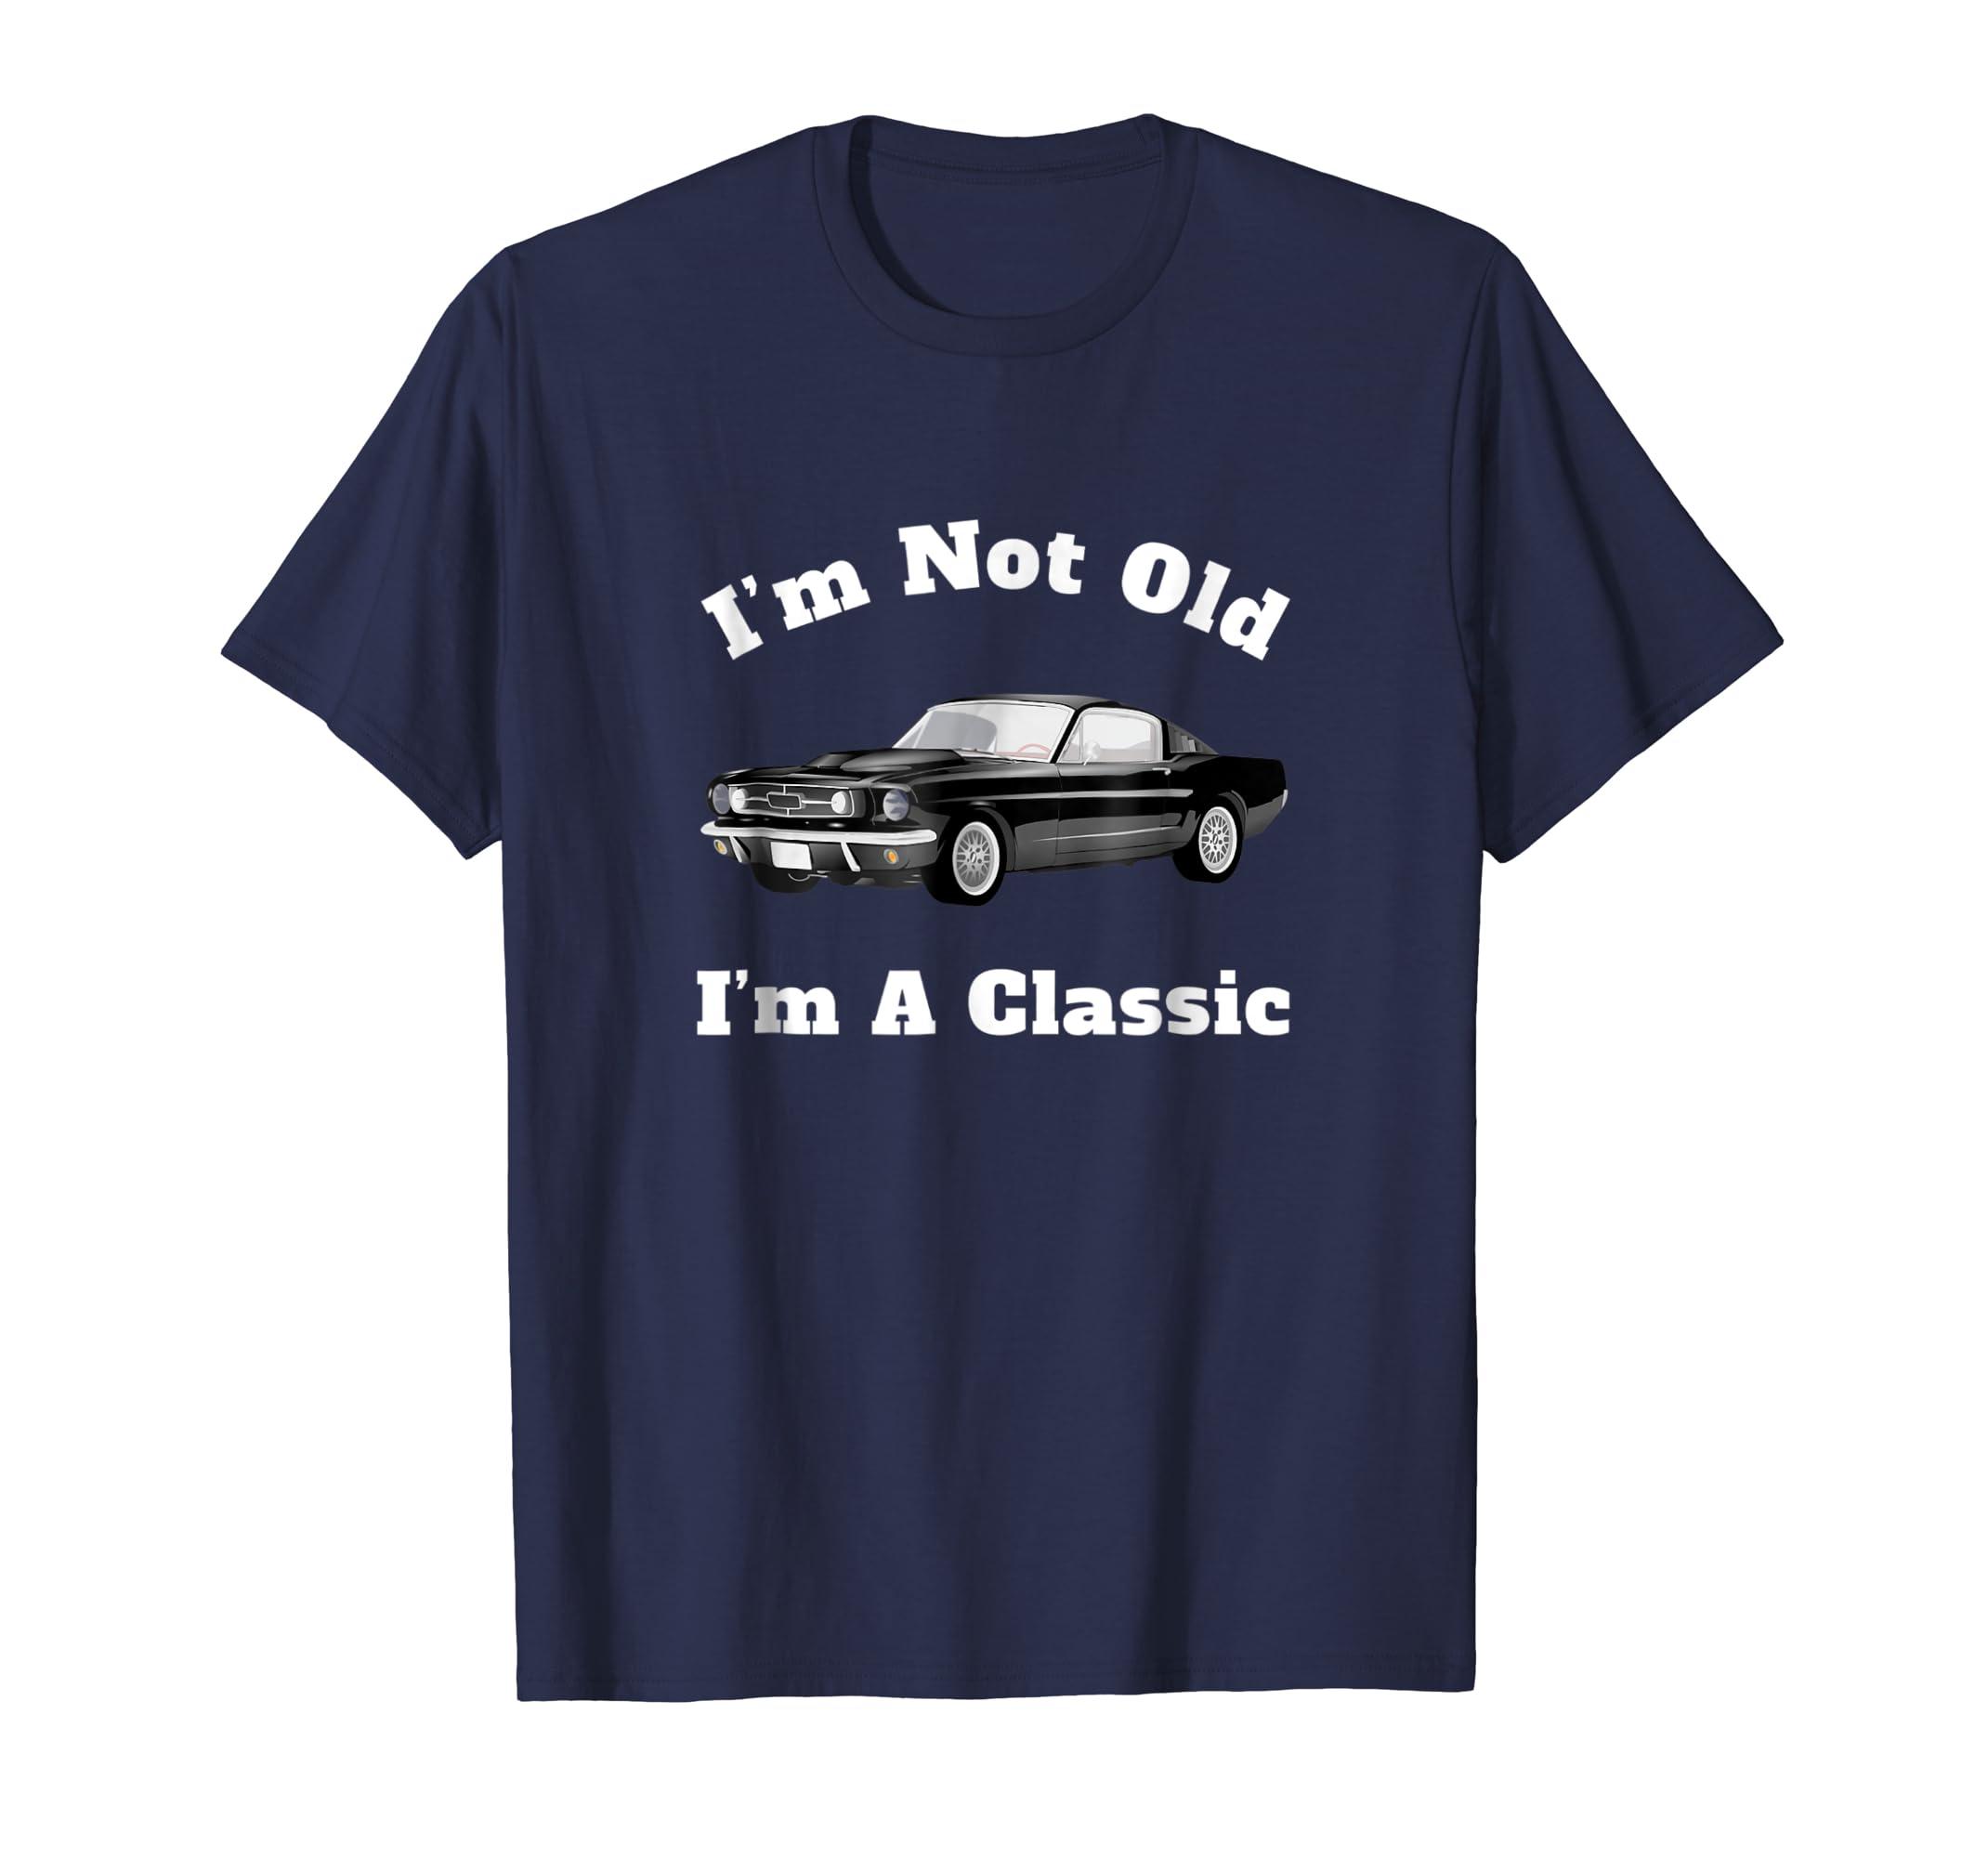 17df6c88 Amazon.com: I'm Not Old I'm A Classic Car Funny T-Shirt - Mens & Womens:  Clothing